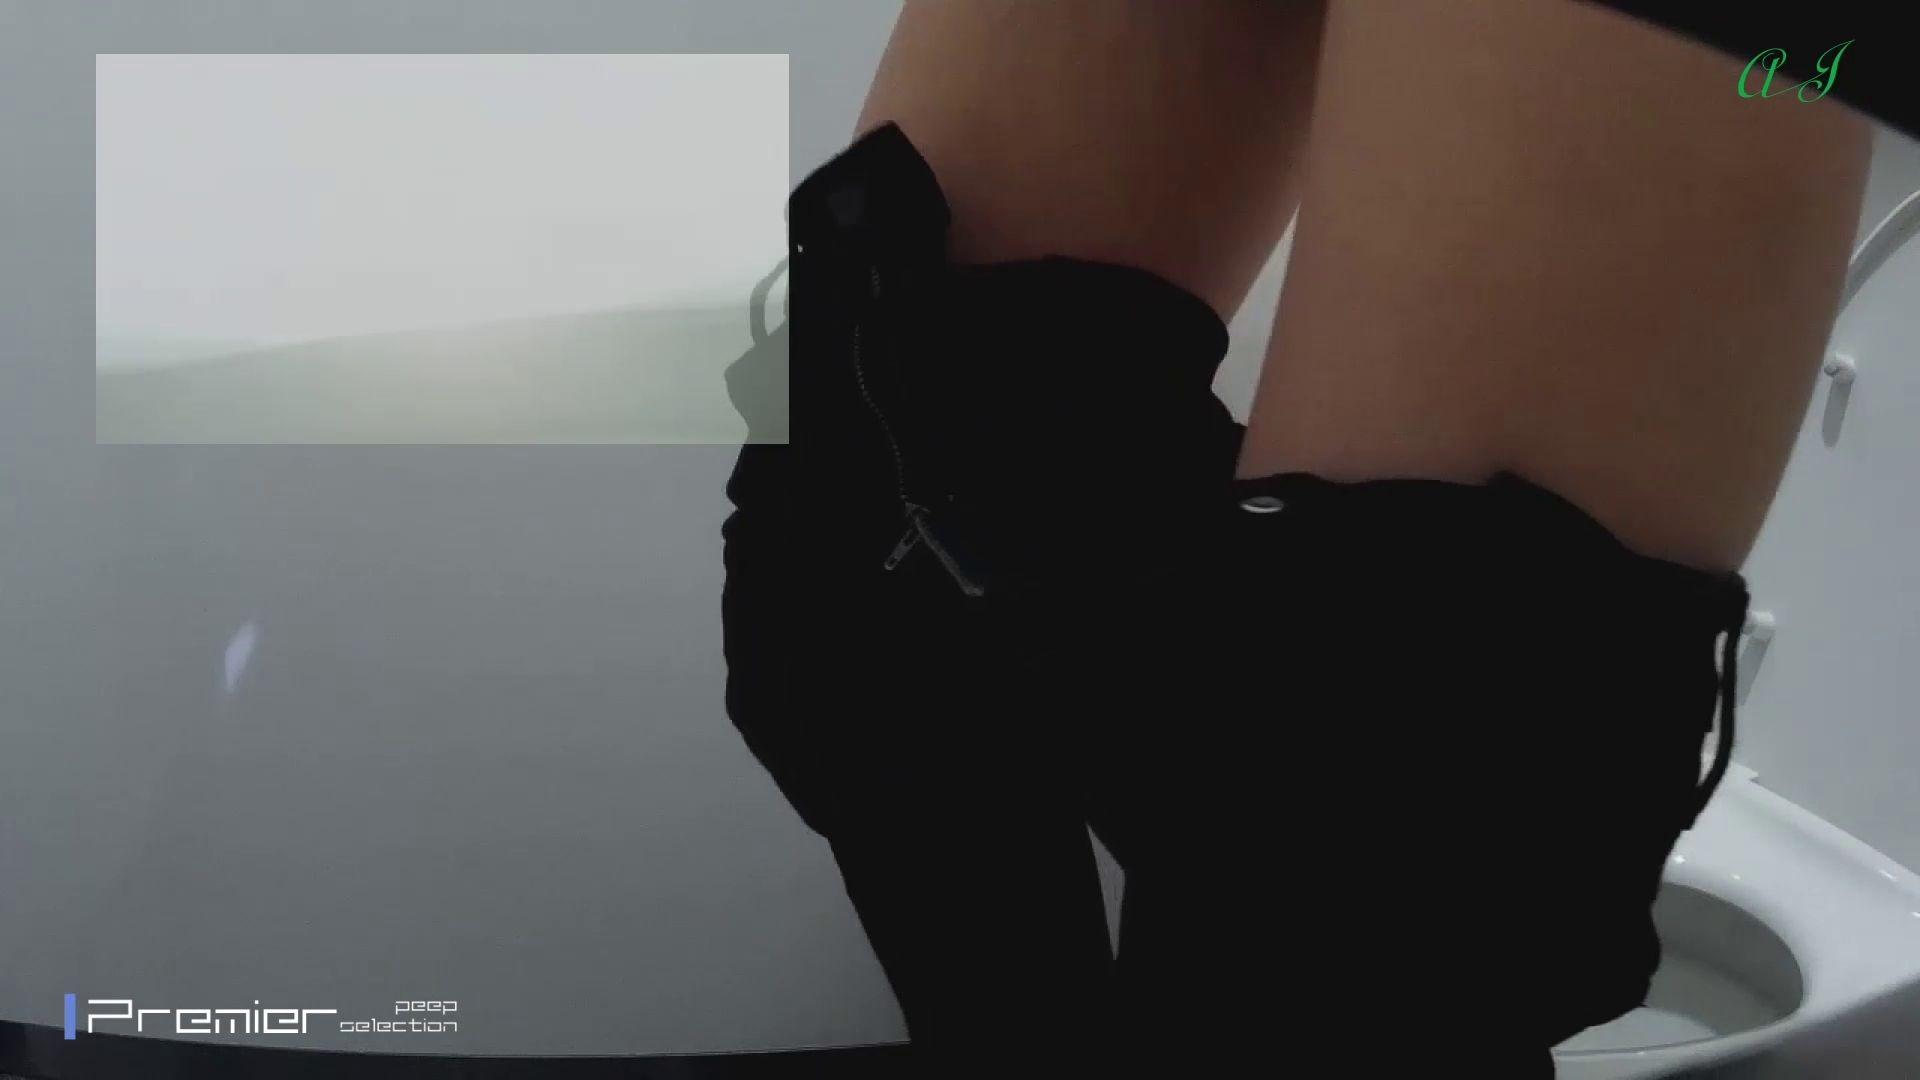 大あり美JDトイレ盗撮【有名大学女性洗面所 vol.80】 高画質  113PIX 81